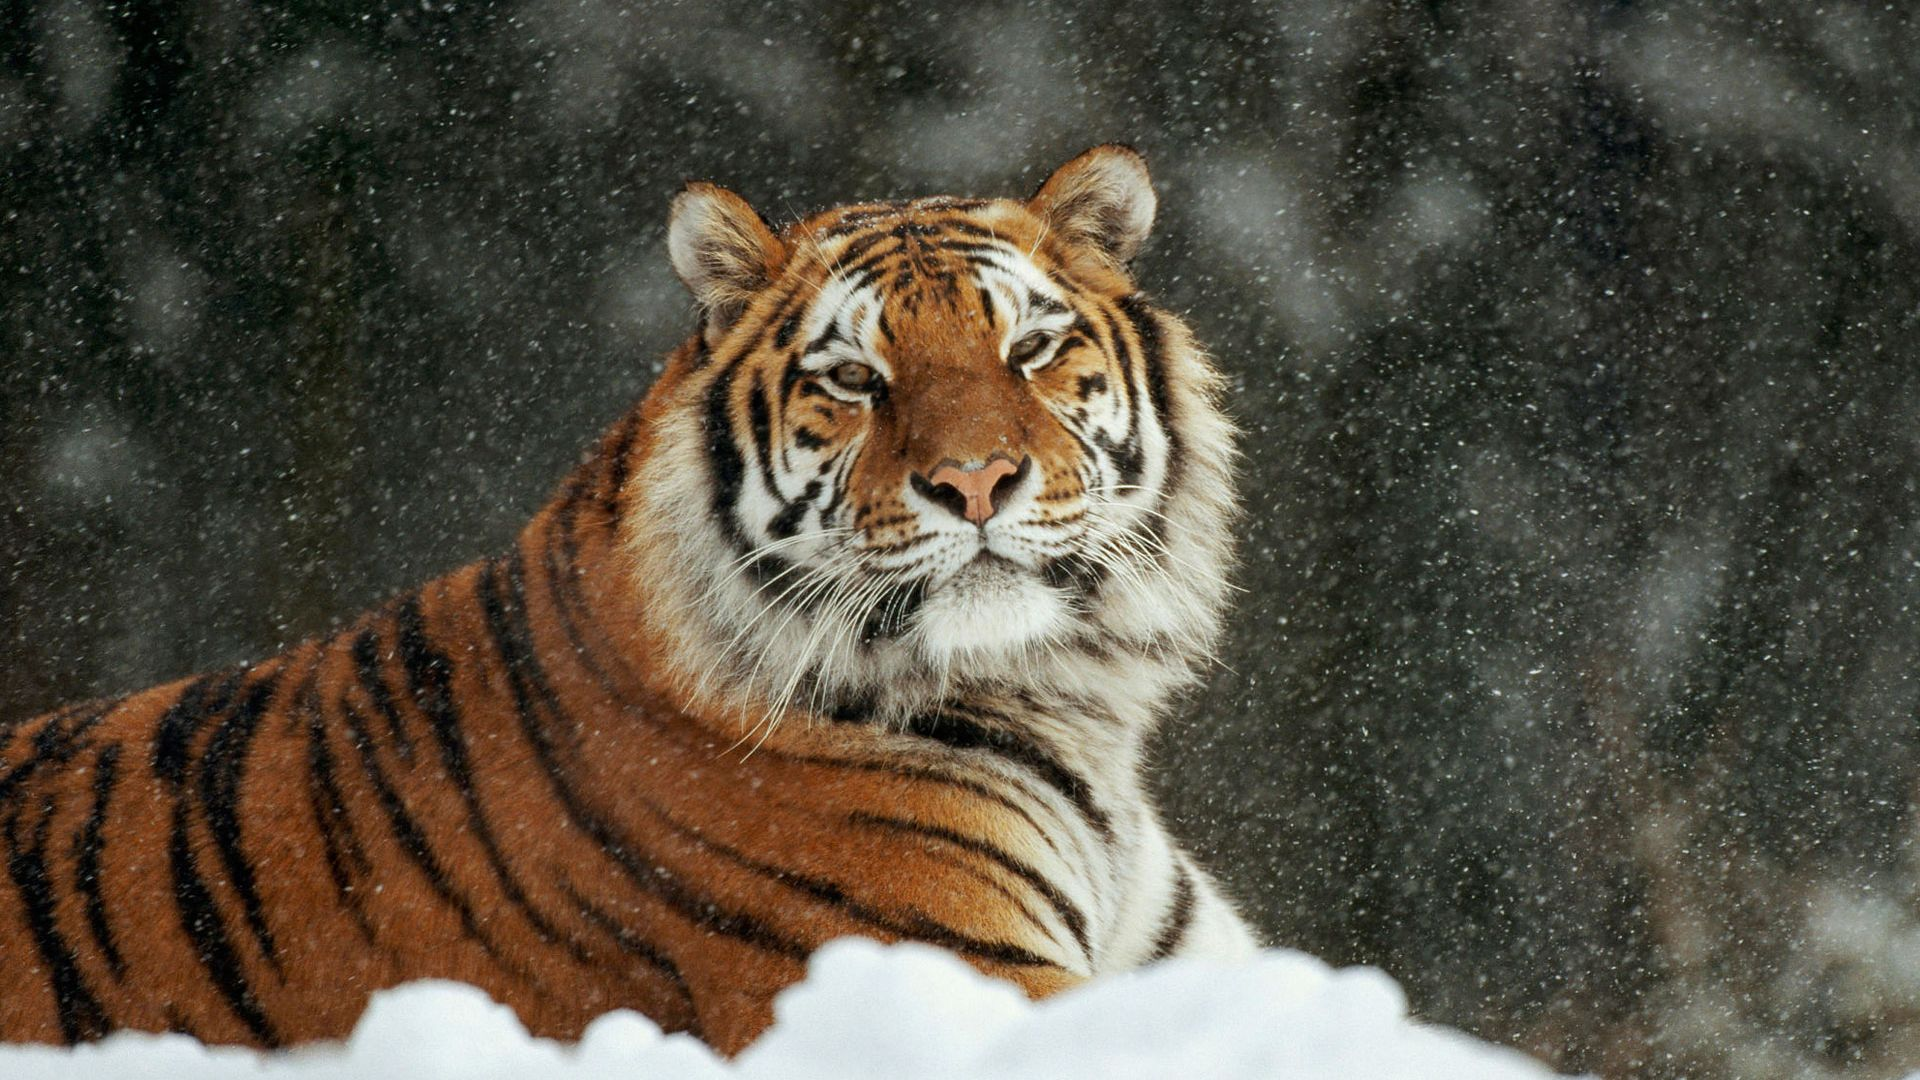 tiger full hd wallpaper desktop backgrounds free download | hd